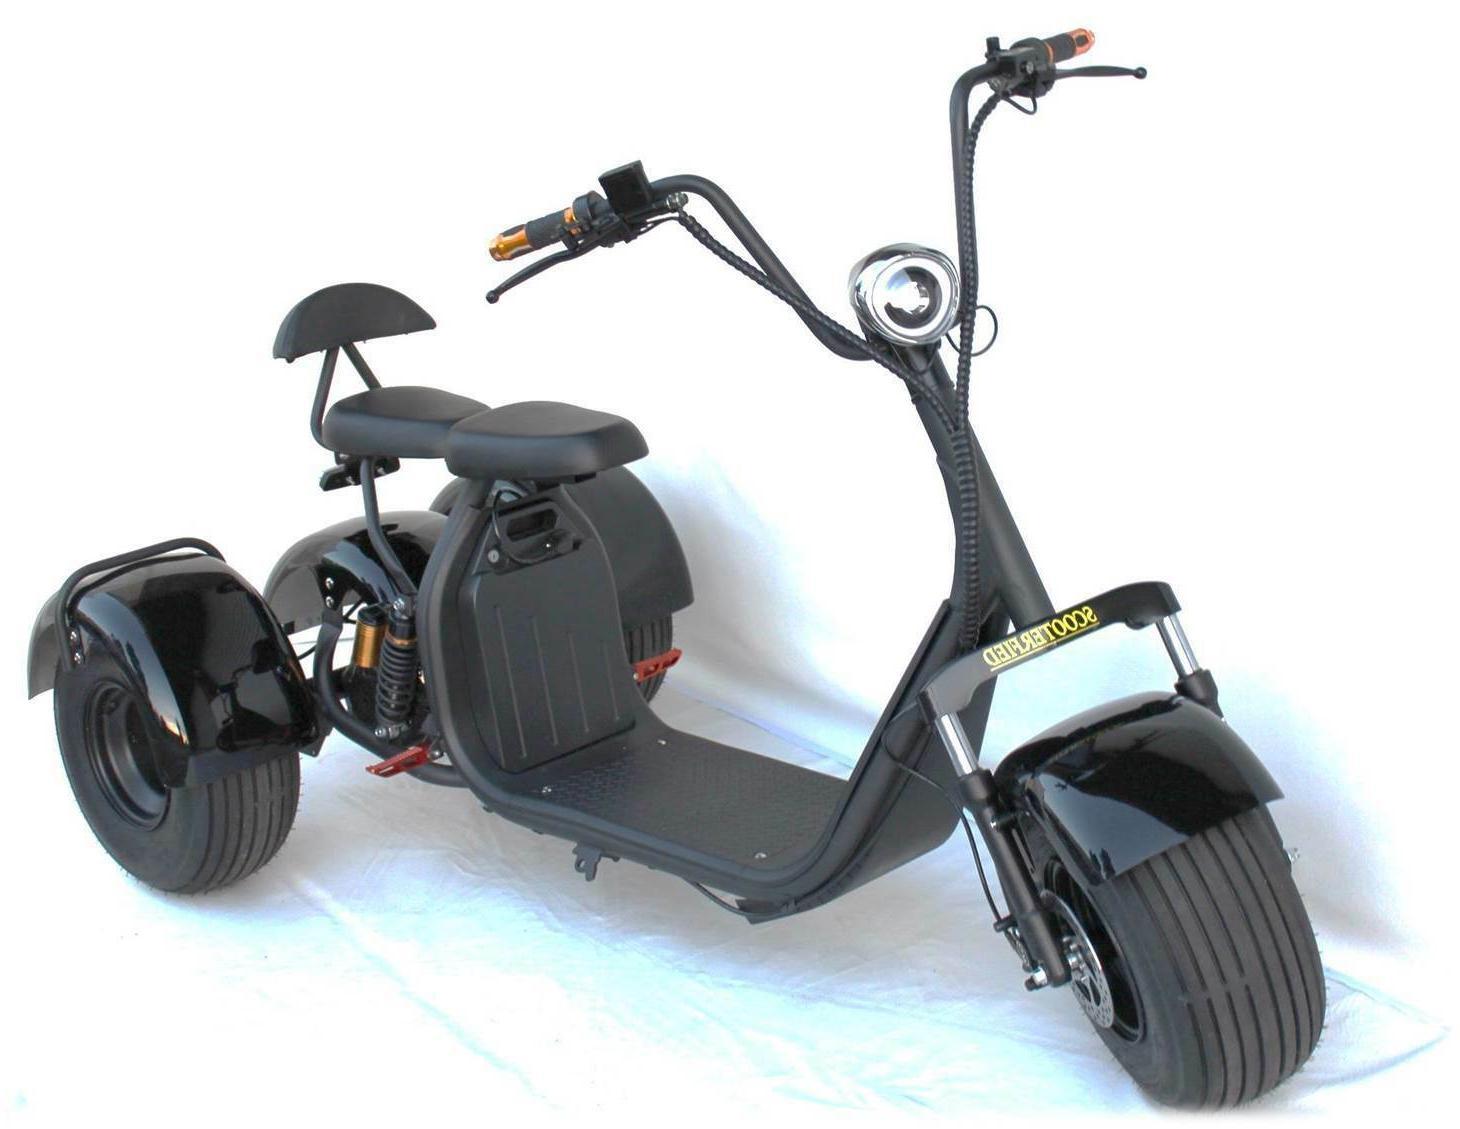 3 Wheel Trike 1500w 60v E-Scooter Scooterfied.com 18.5 Fat T